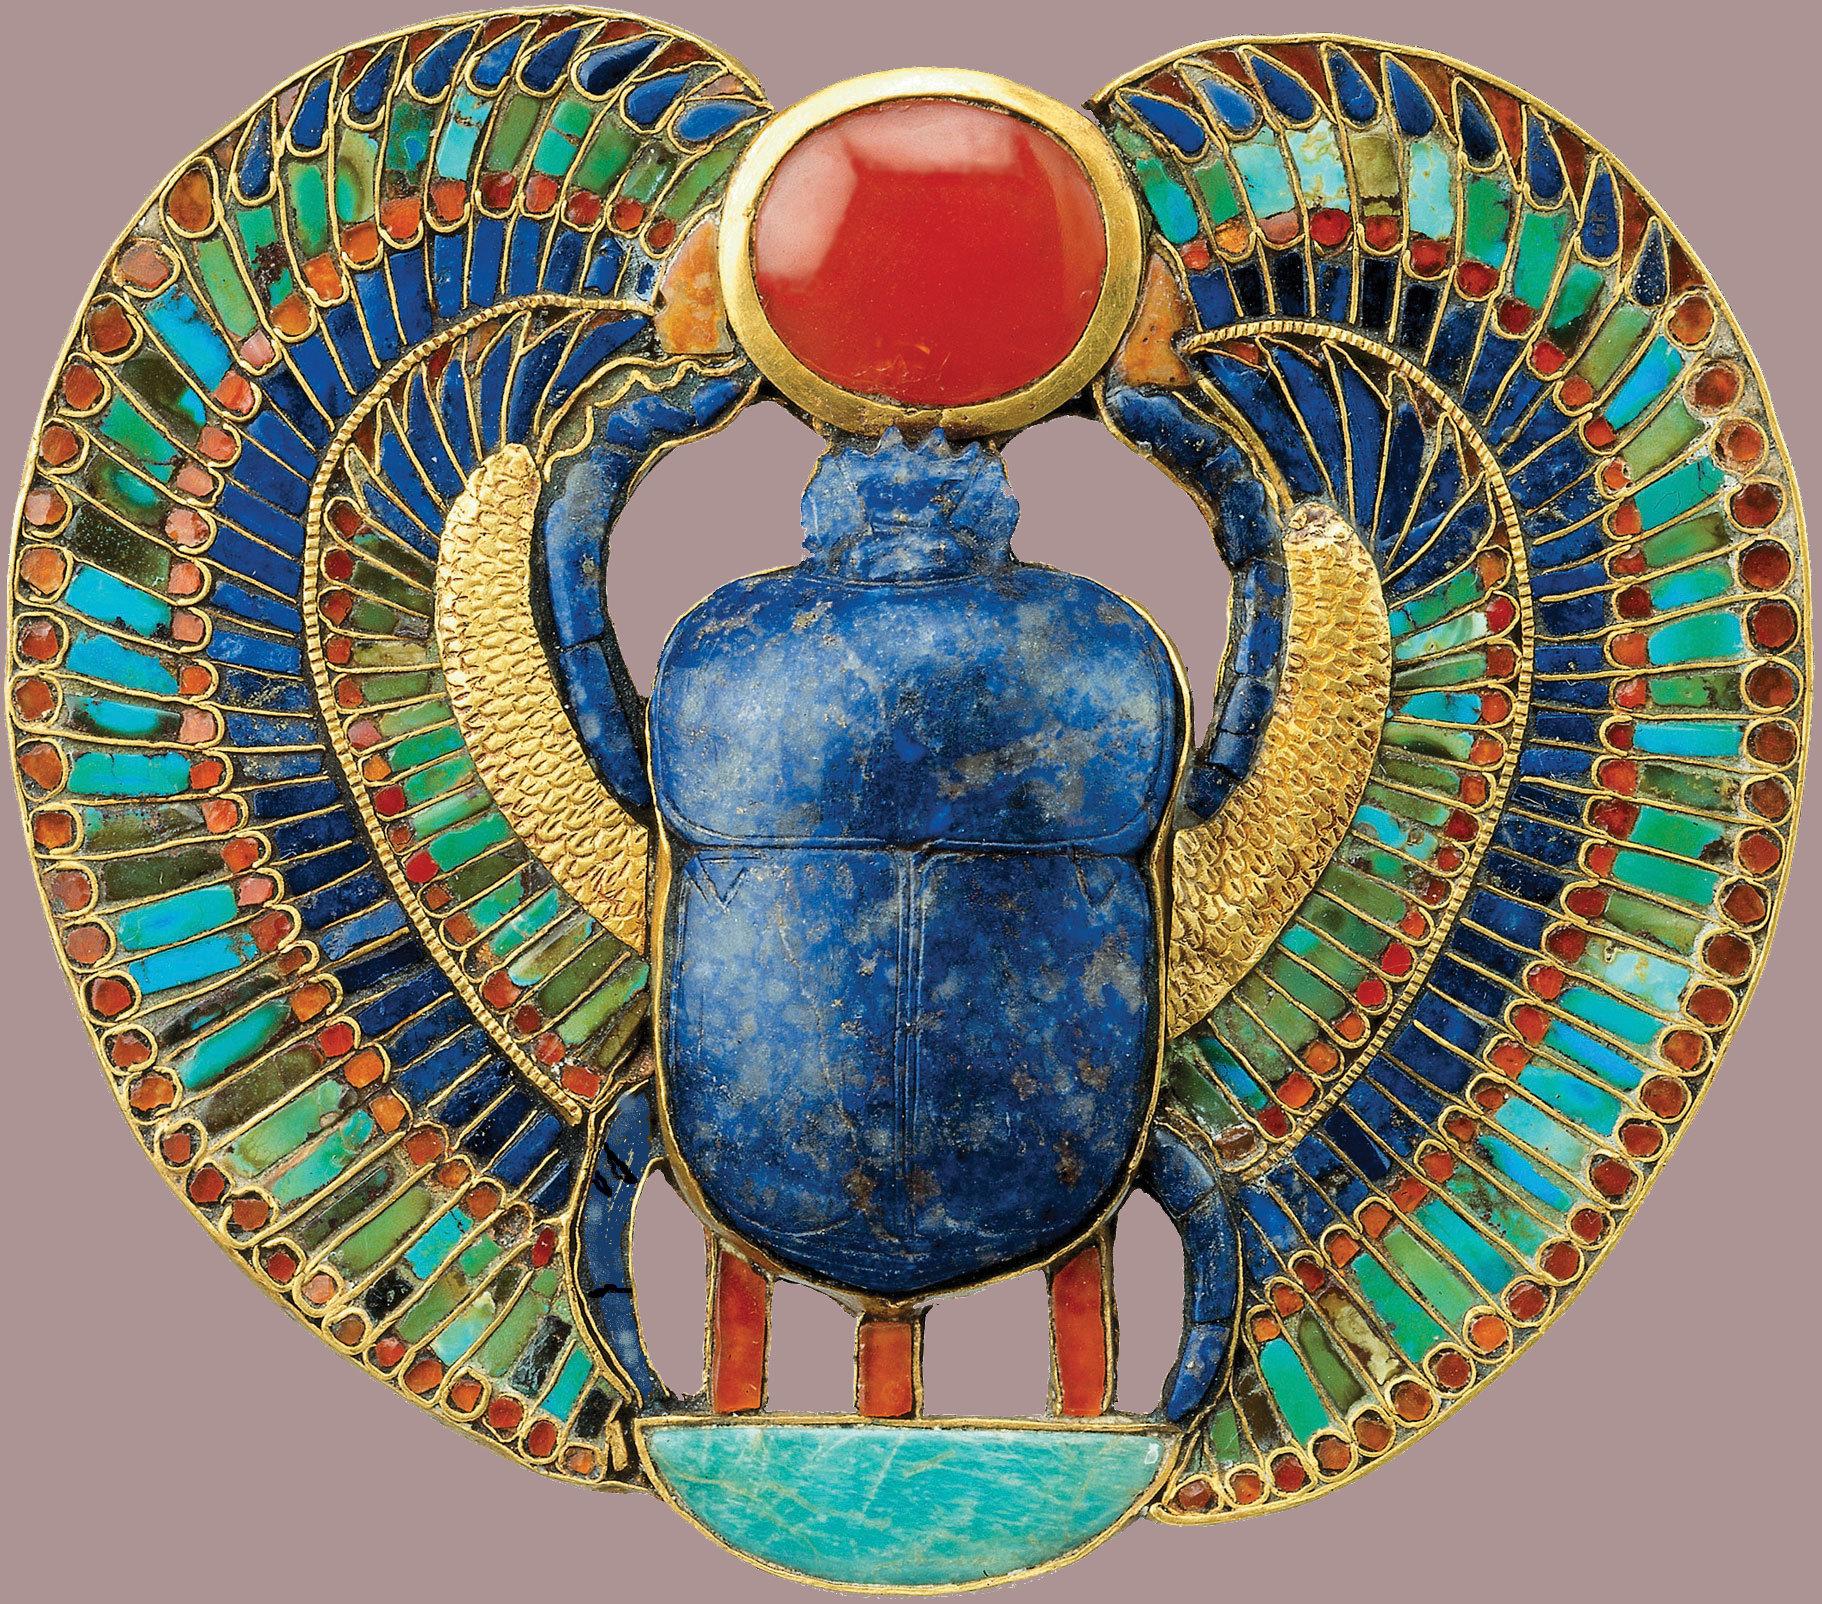 Tutankhamun's gold.